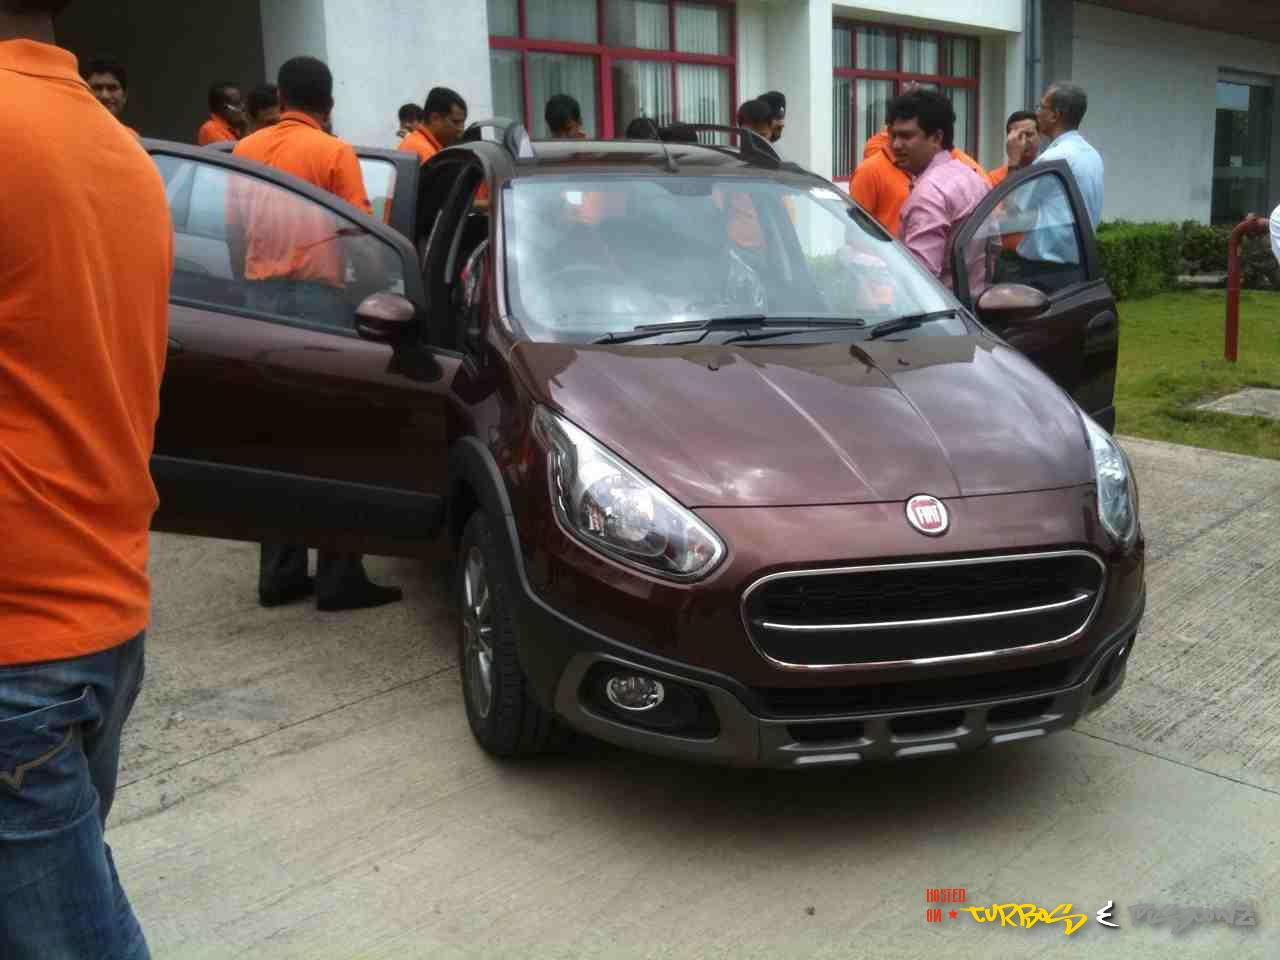 Fiat-Avventura-Pics-Bronzo-Tan-Color-Pic (3)